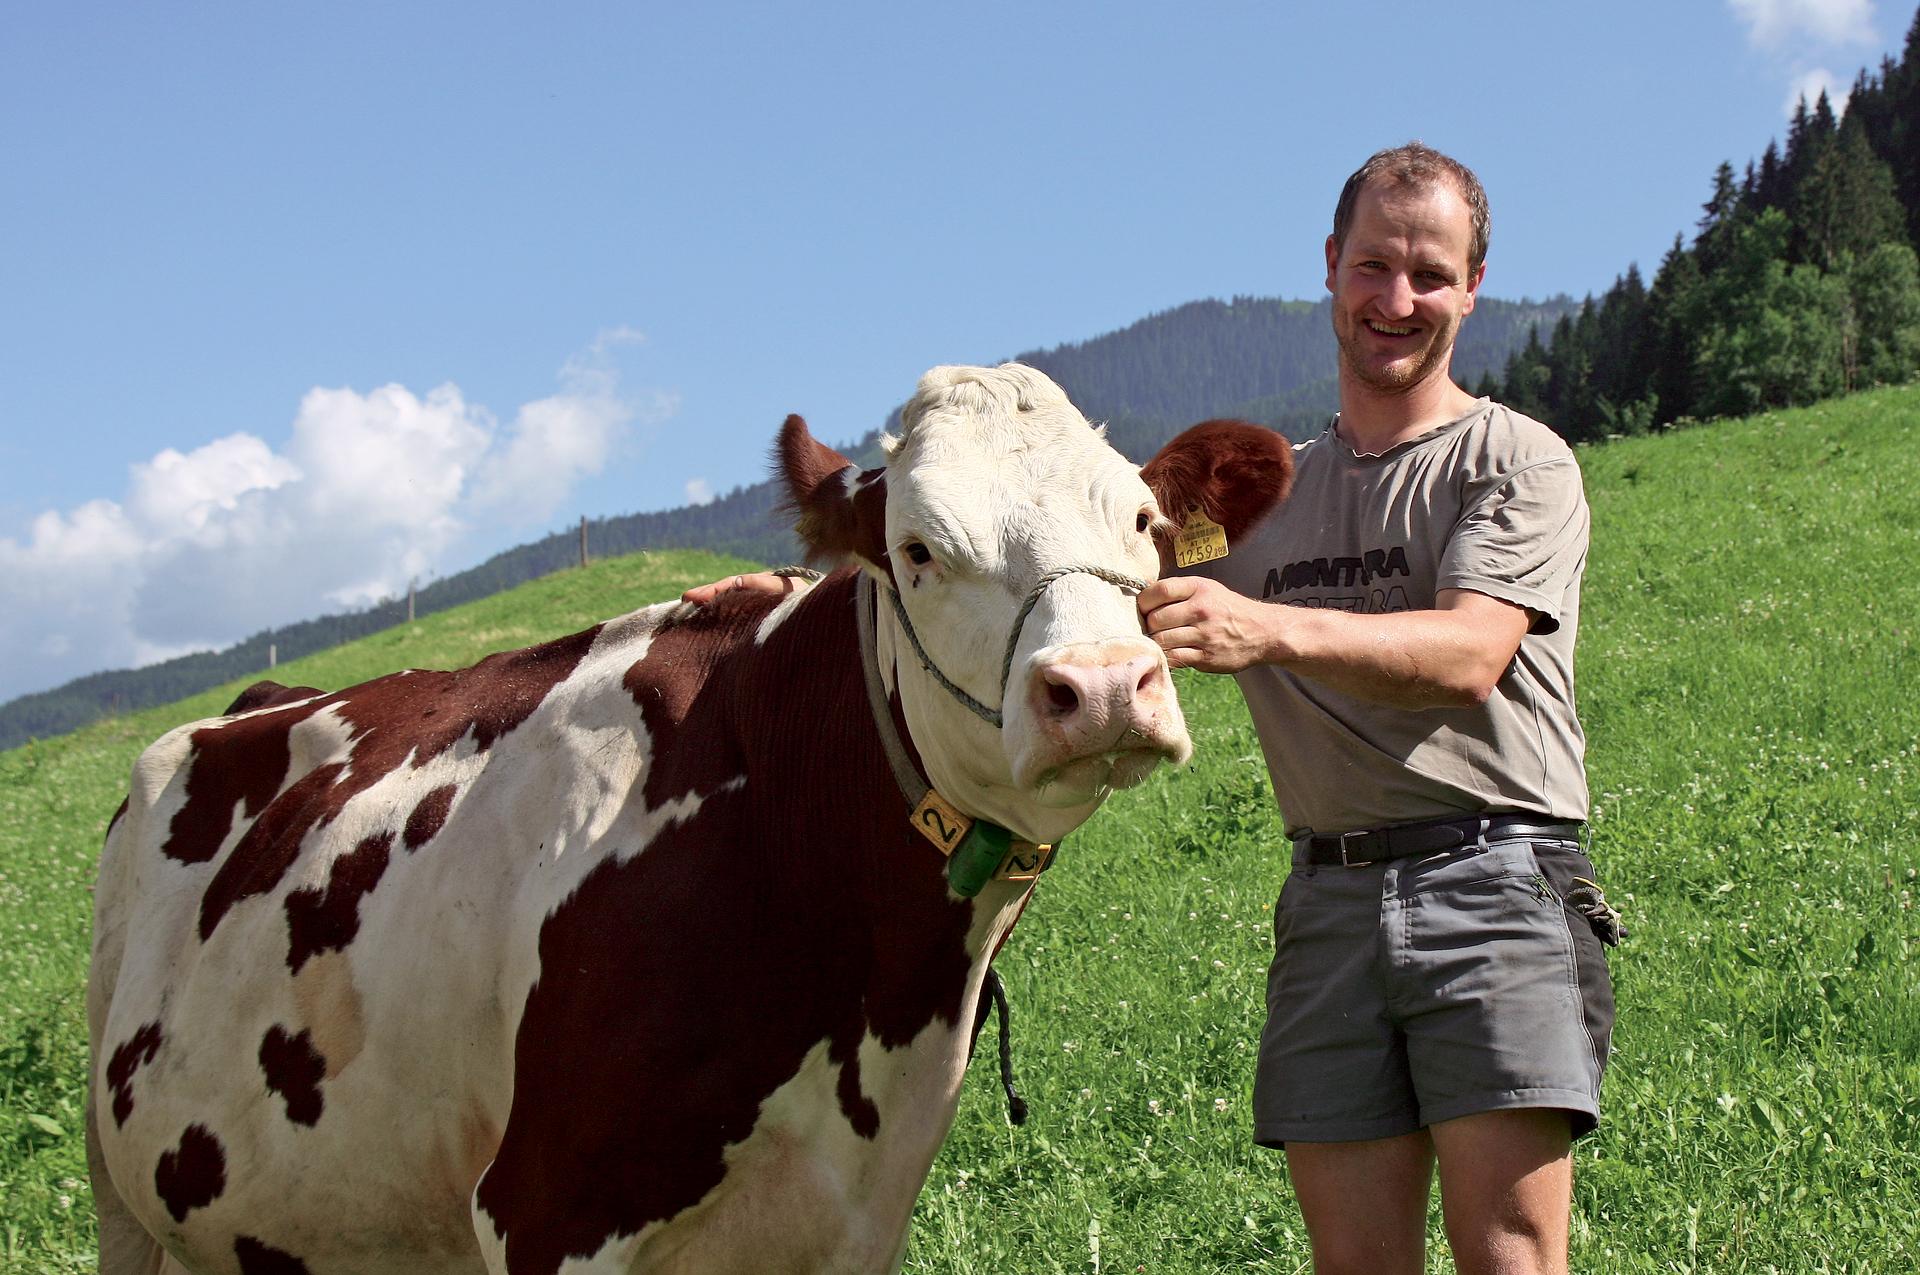 Rupert Viehhauser